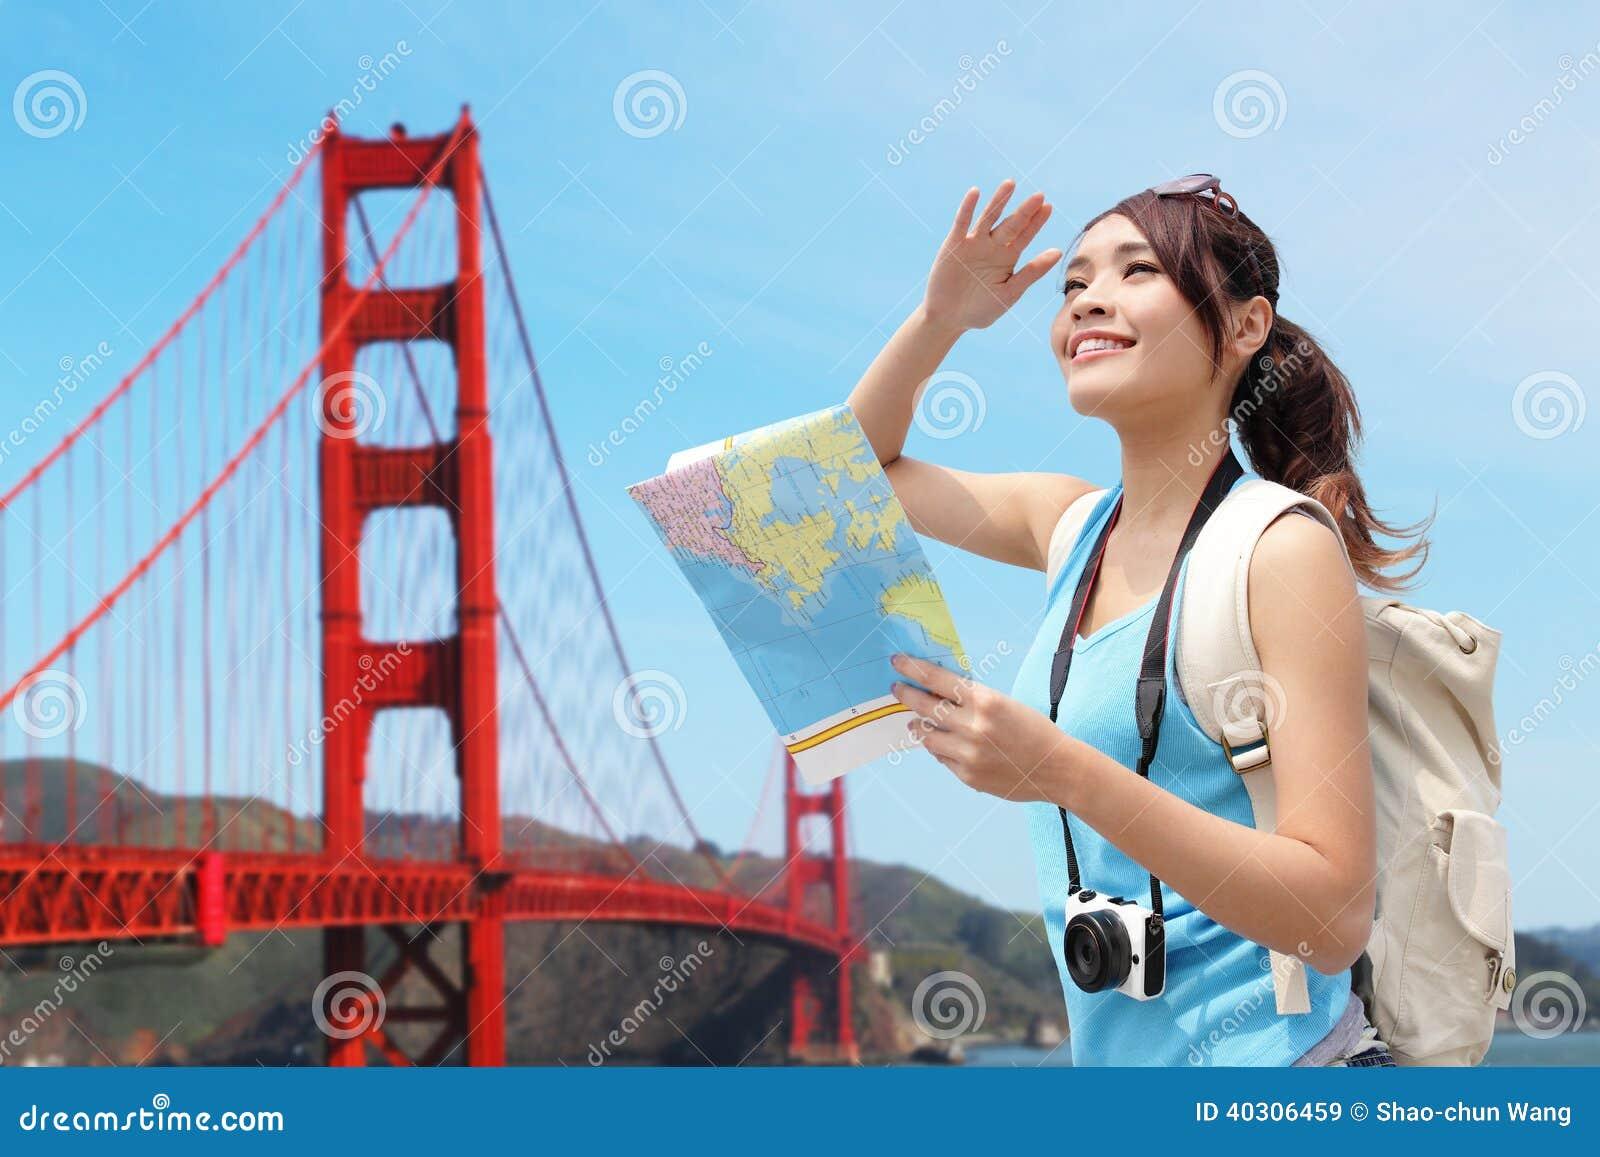 For San Francisco Looking Female Fwb